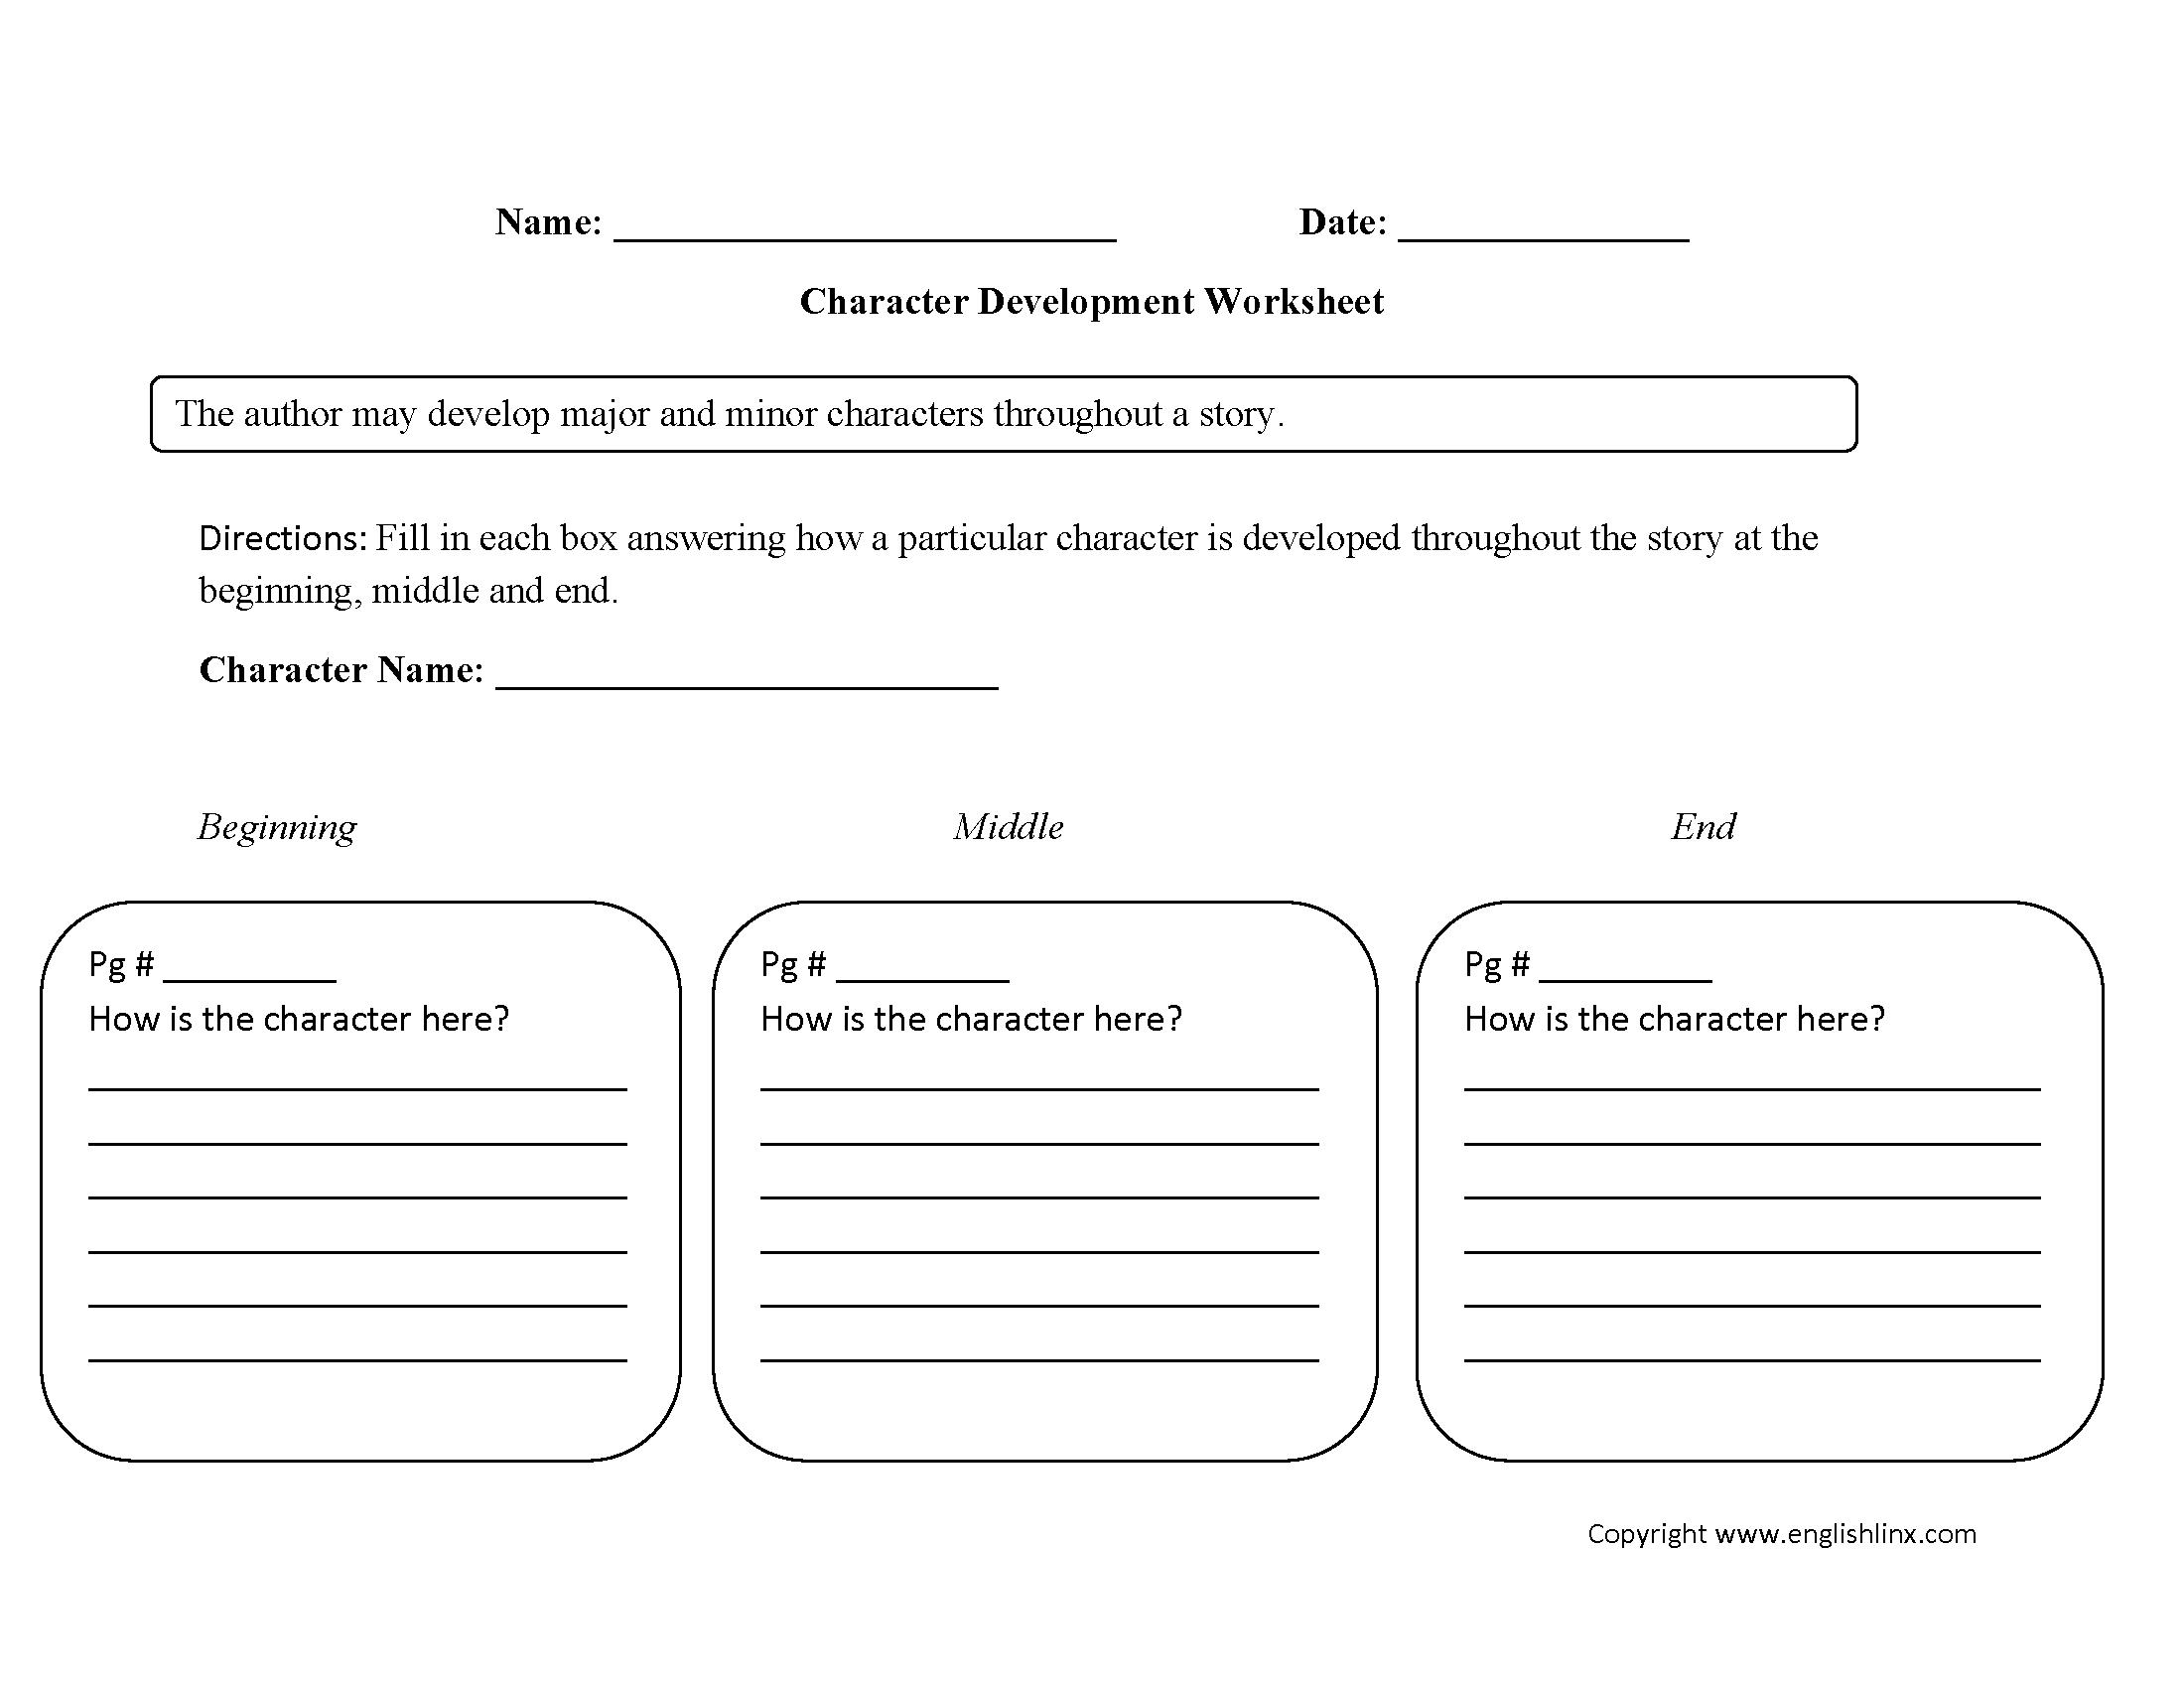 Single Character Development Characterysis Worksheet